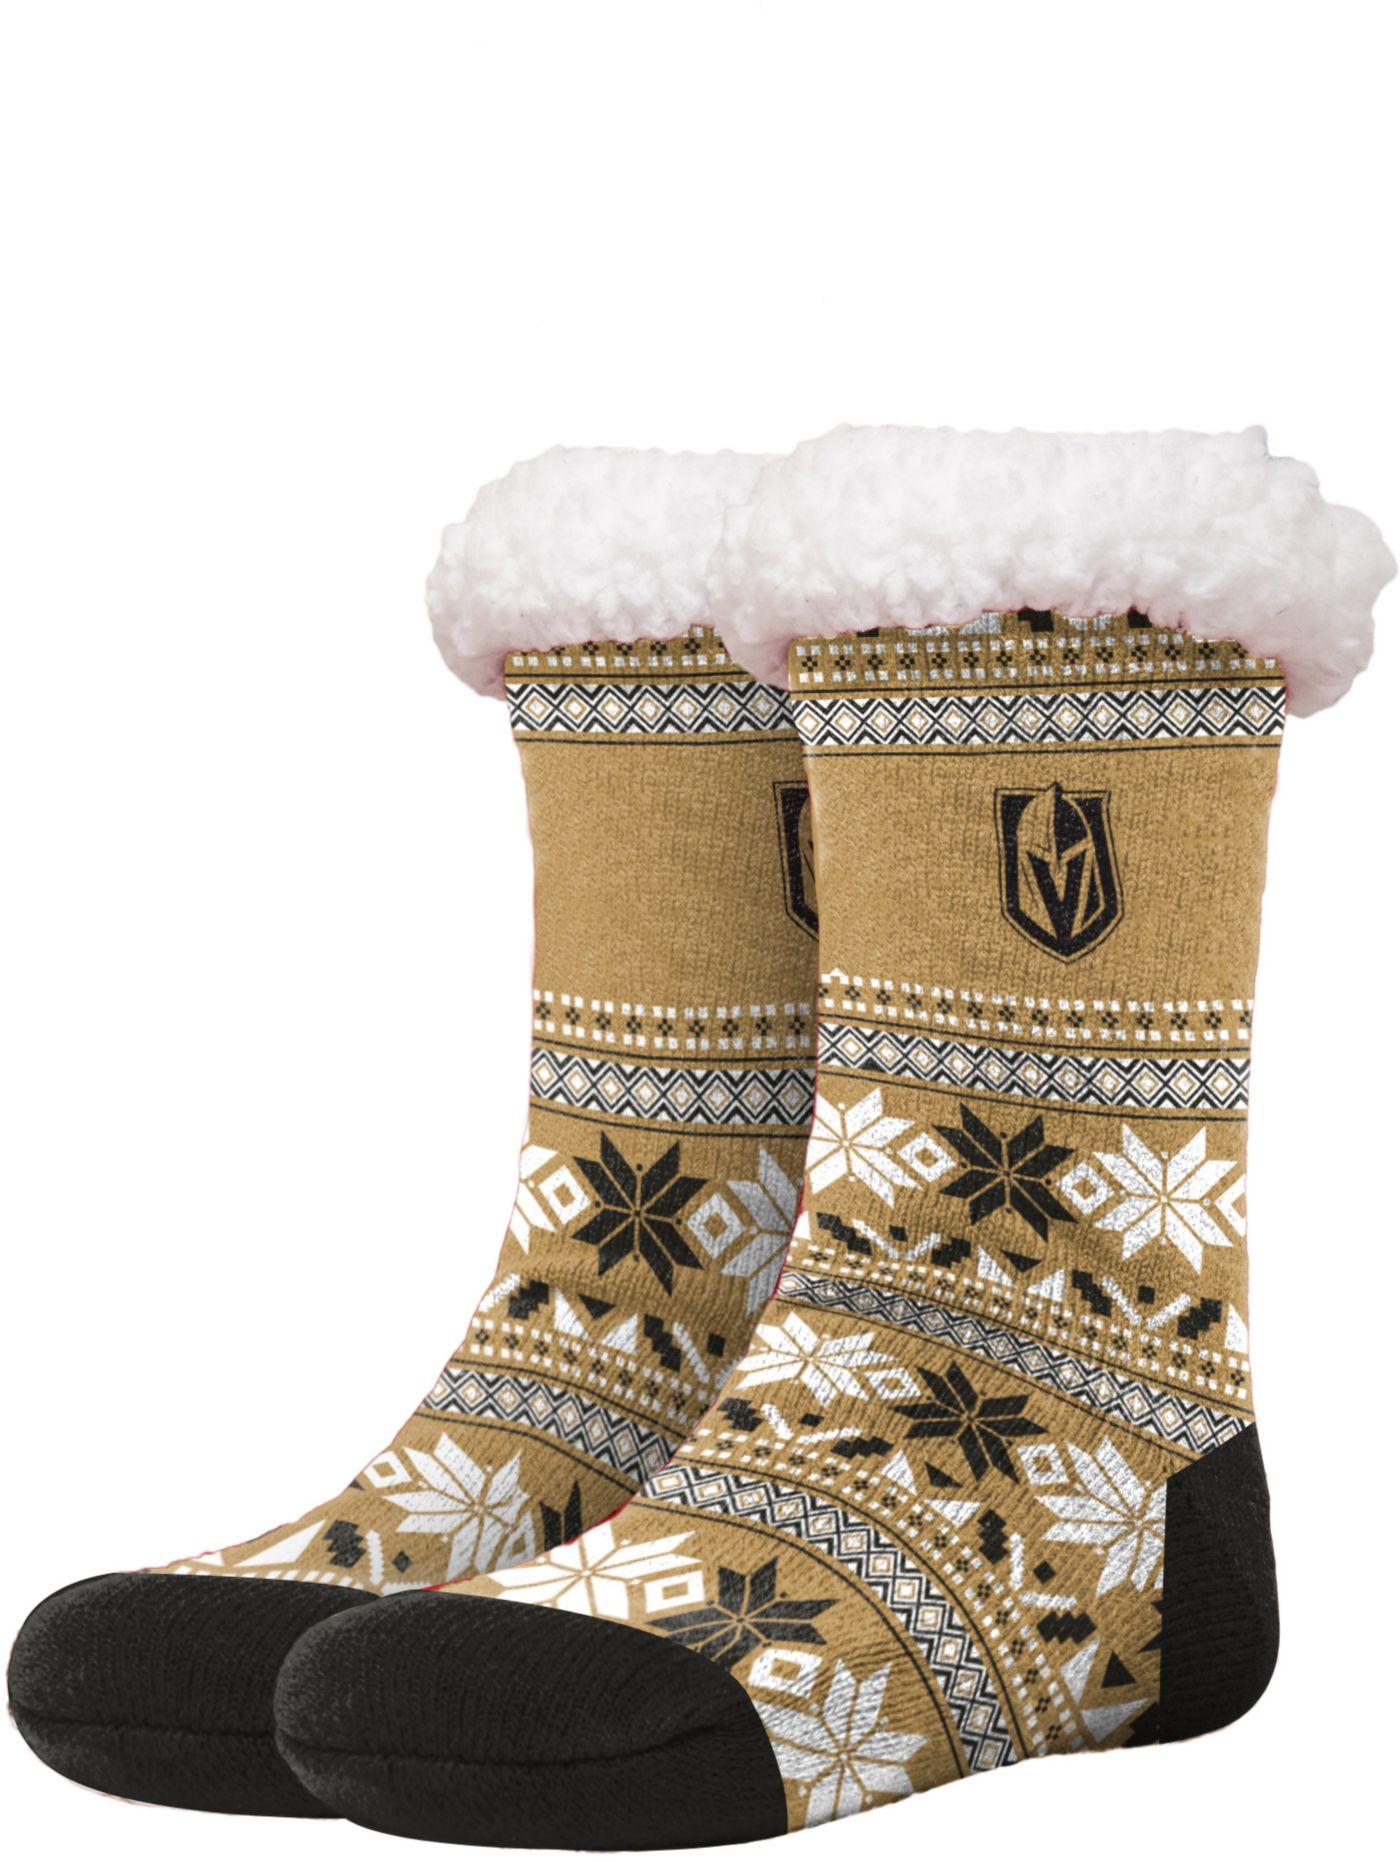 FOCO Vegas Golden Knights Footy Slippers